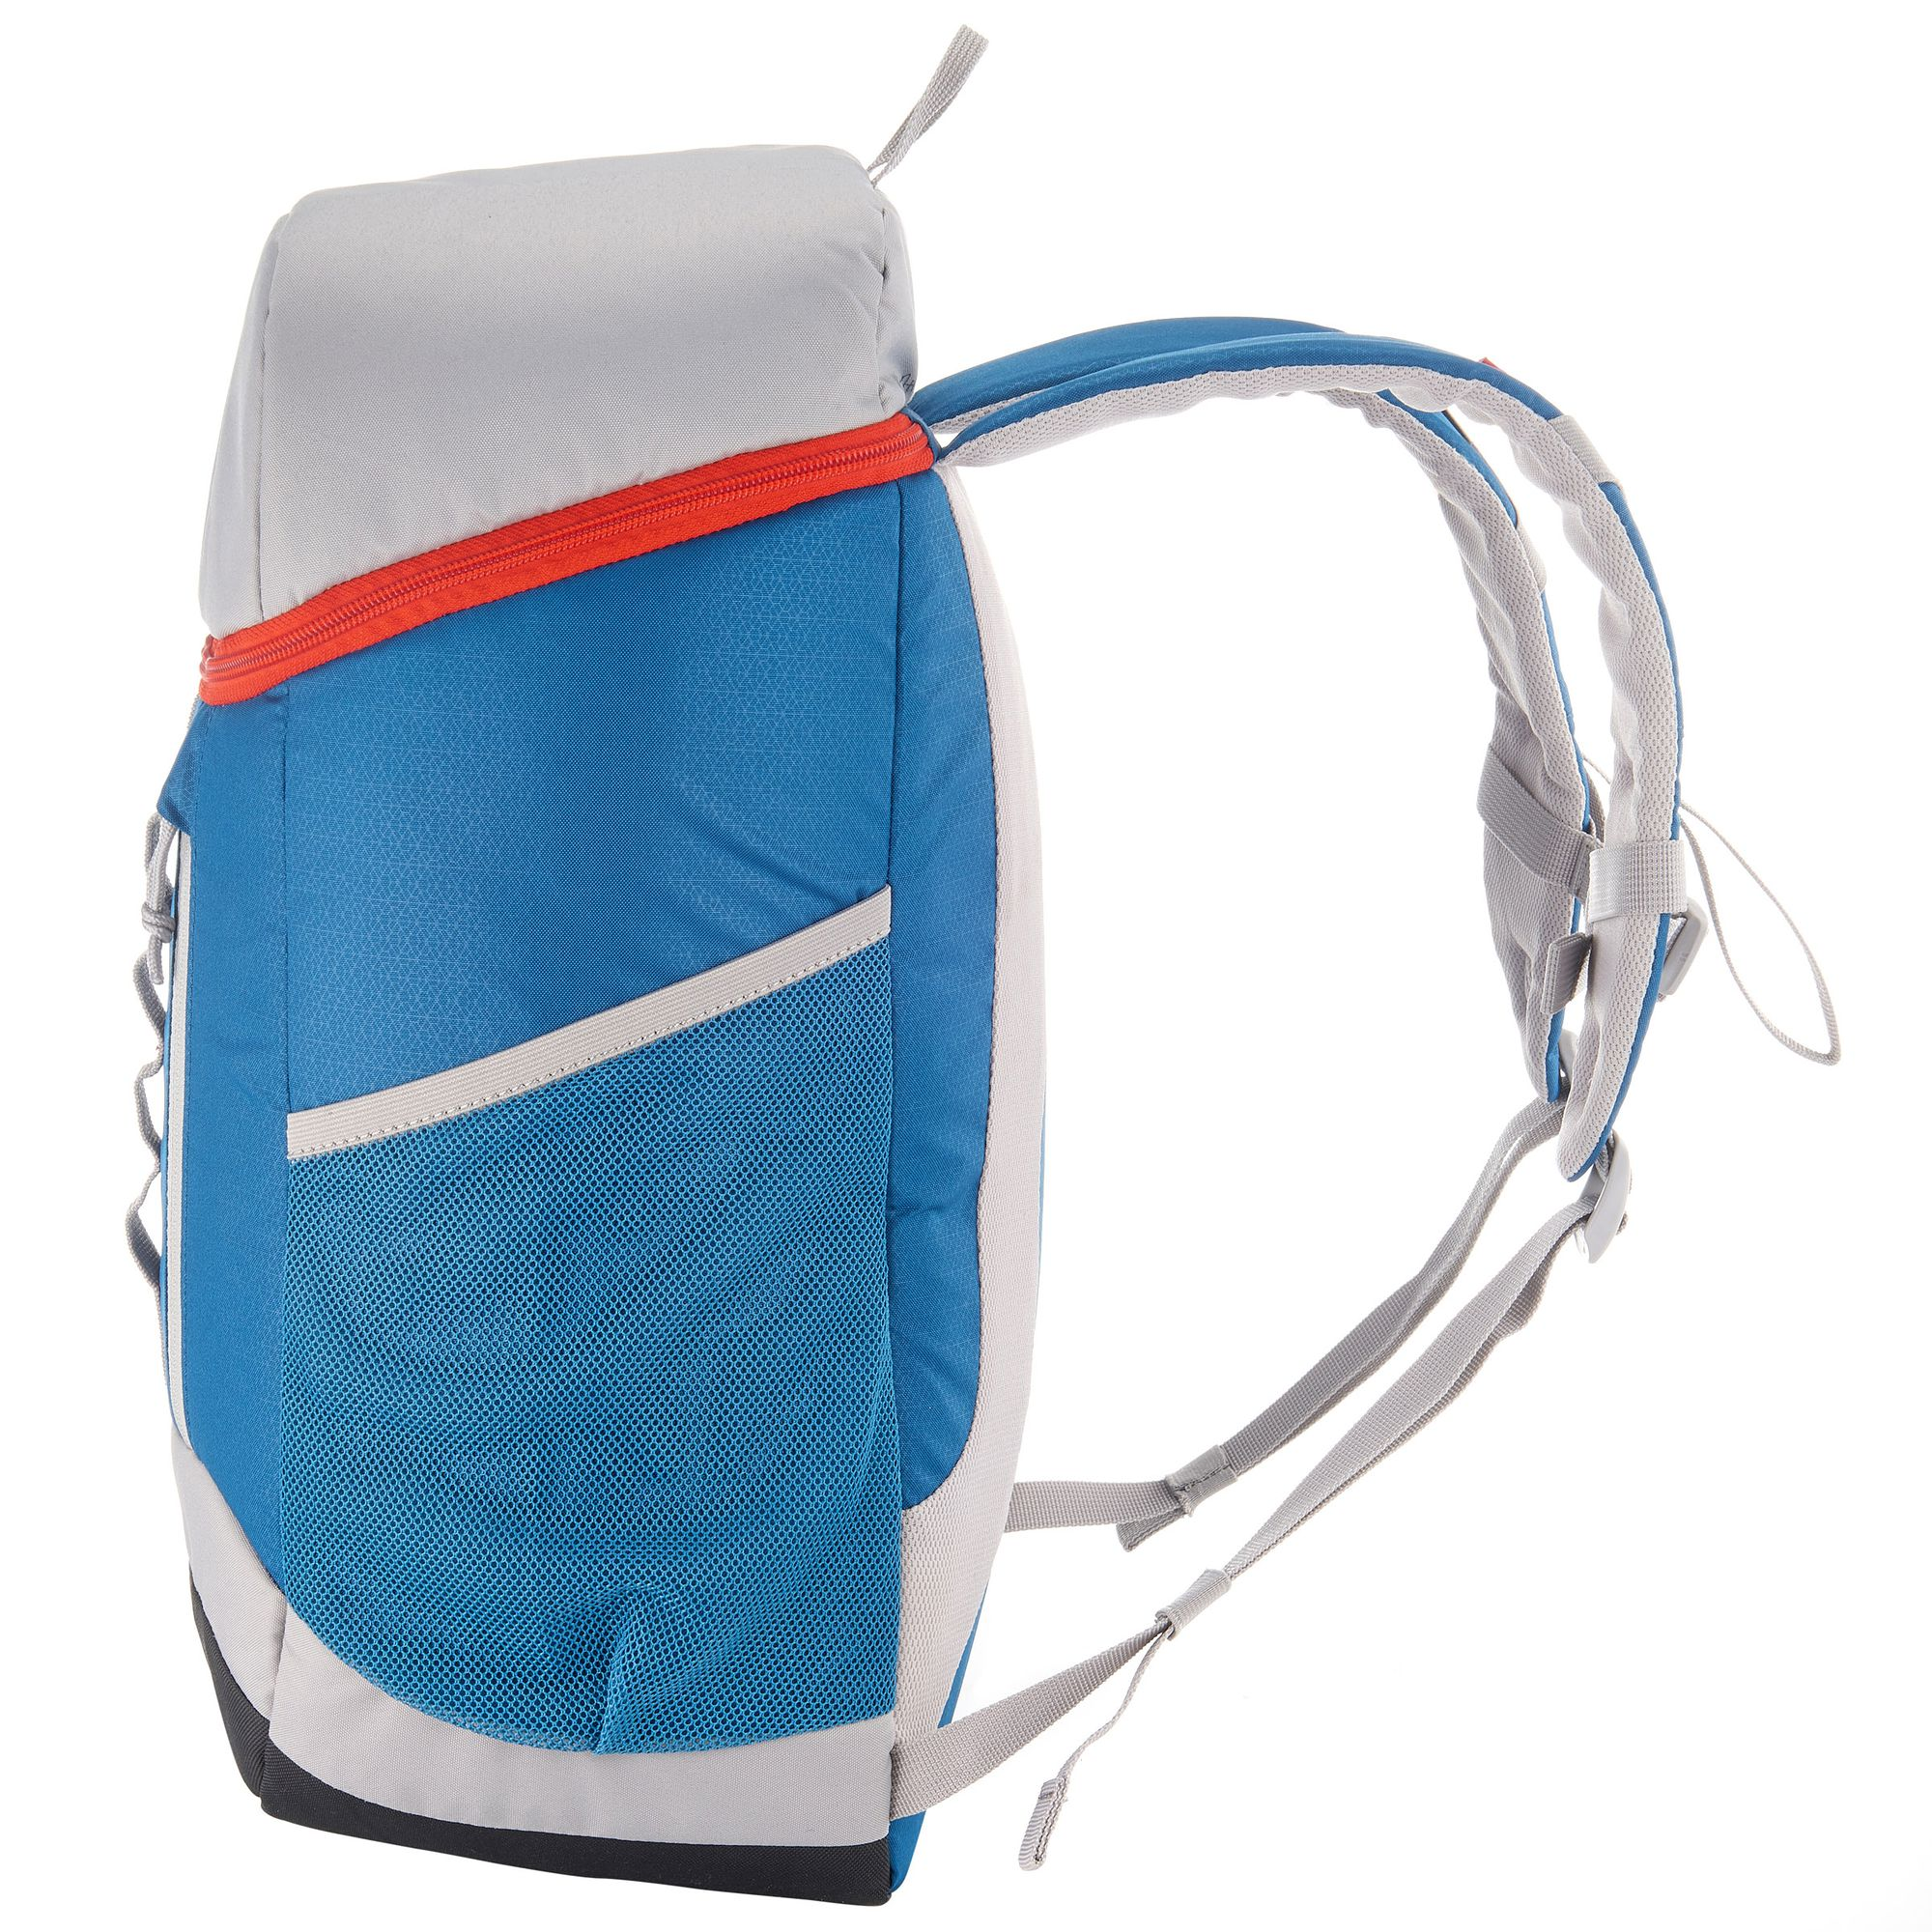 sac a dos glaciere randonnee forclaz 20 l bleu clubs collectivit s decathlon pro. Black Bedroom Furniture Sets. Home Design Ideas